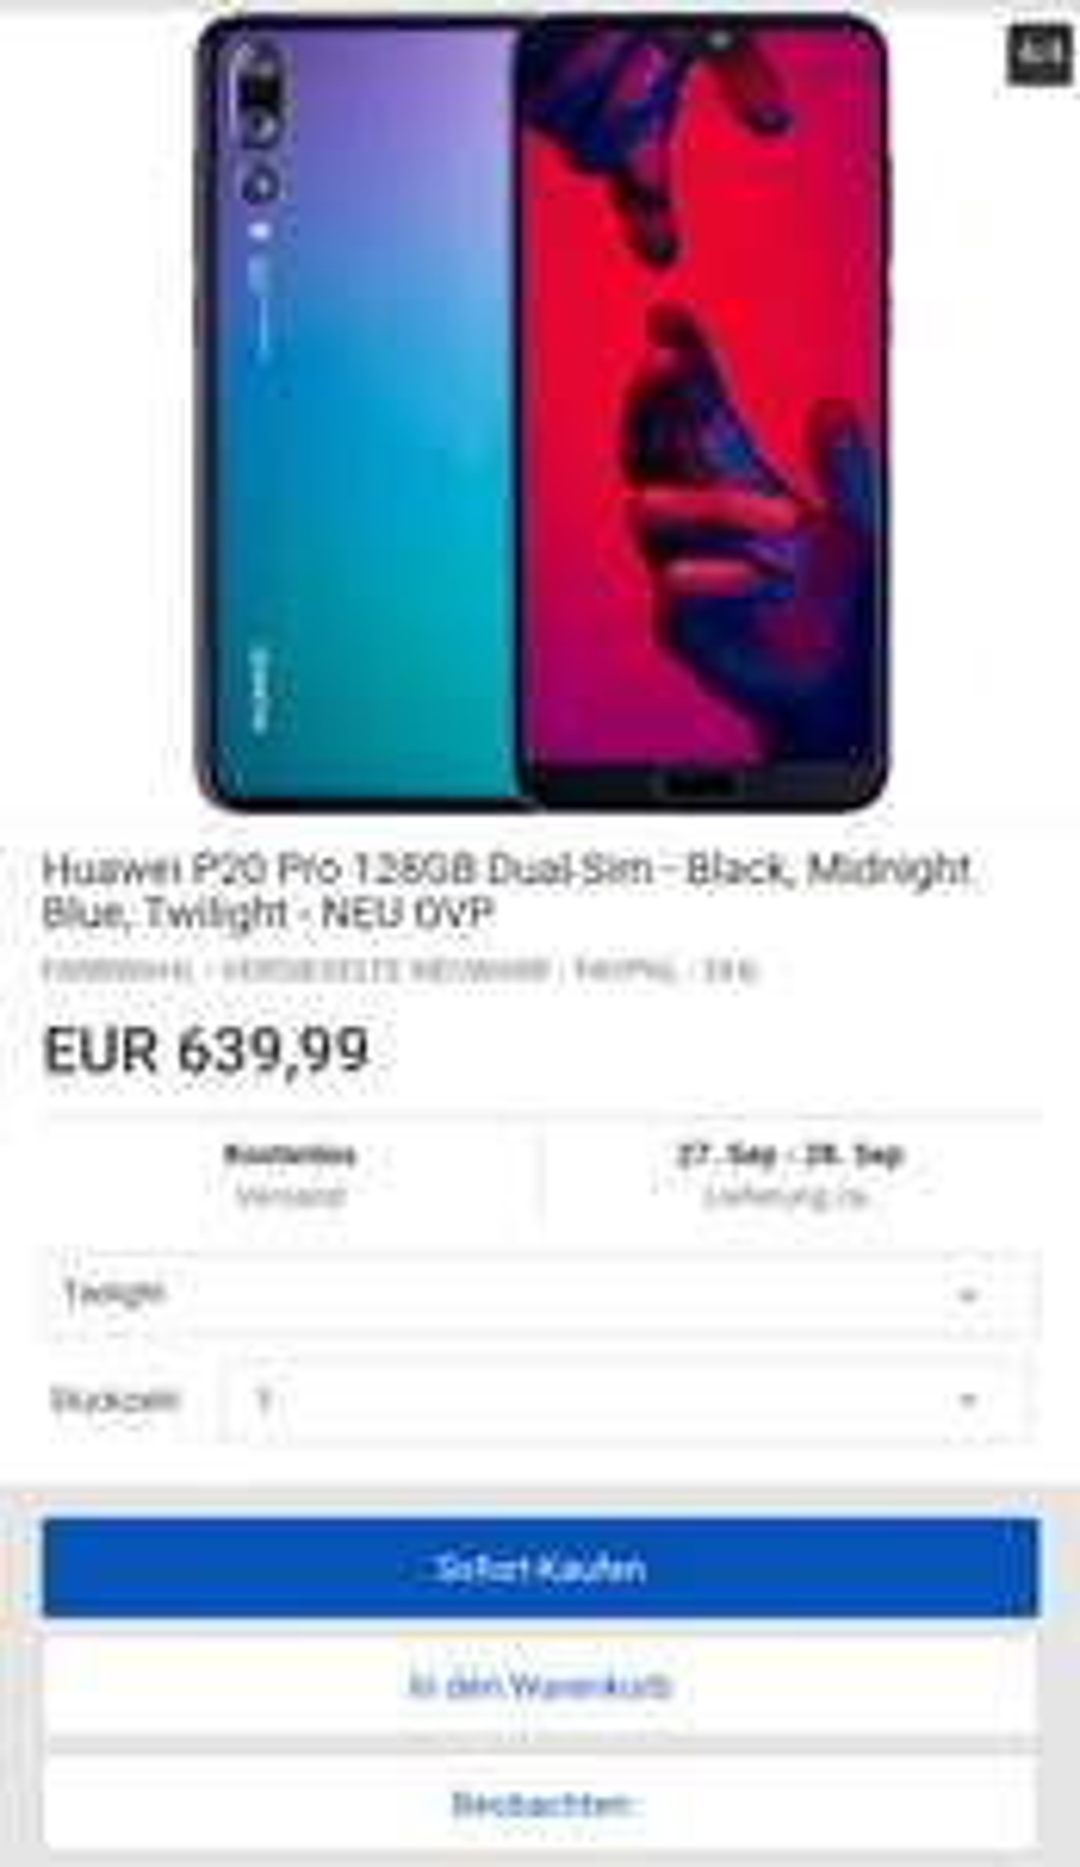 Huawei P20 Pro 128GB Dual SIM für 639,99€ bei eBay in blau oder twilight